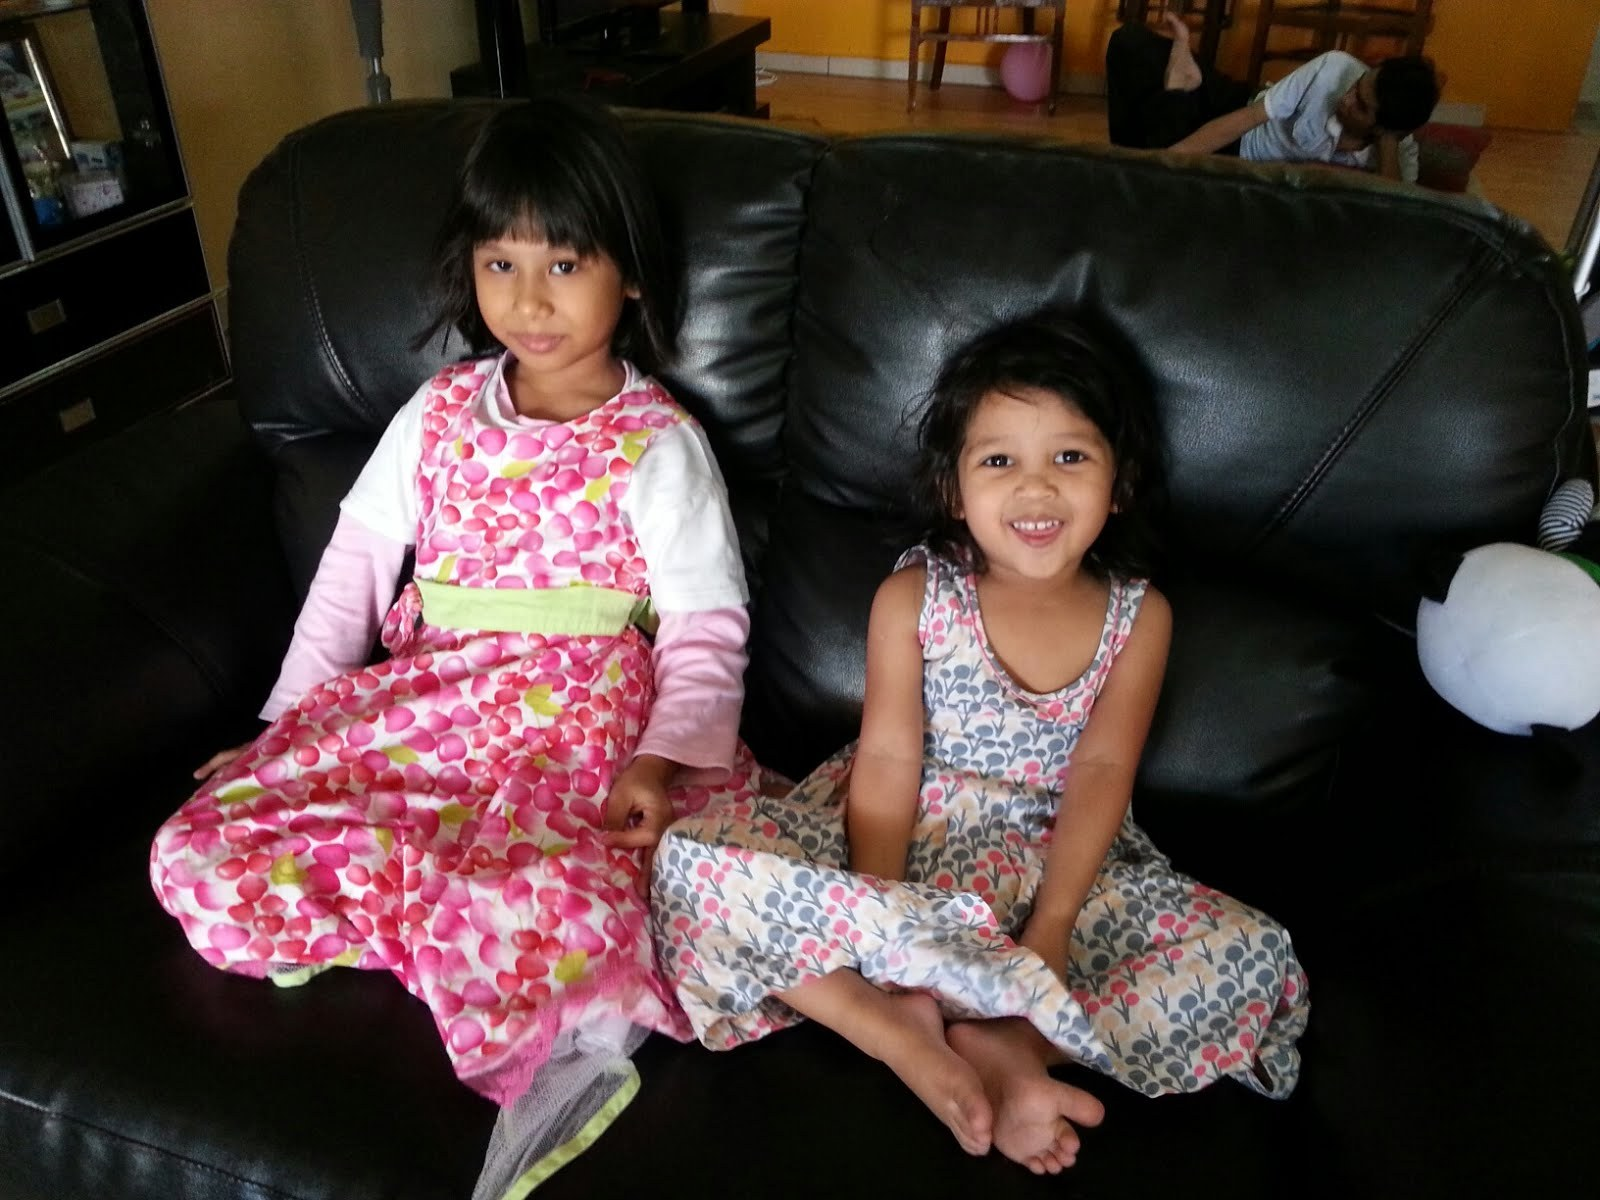 Inspirasi Baju Lebaran Yg Lagi Ngetren 3id6 Aku Era Nazeera Lagi Gambar Besday Muslimah